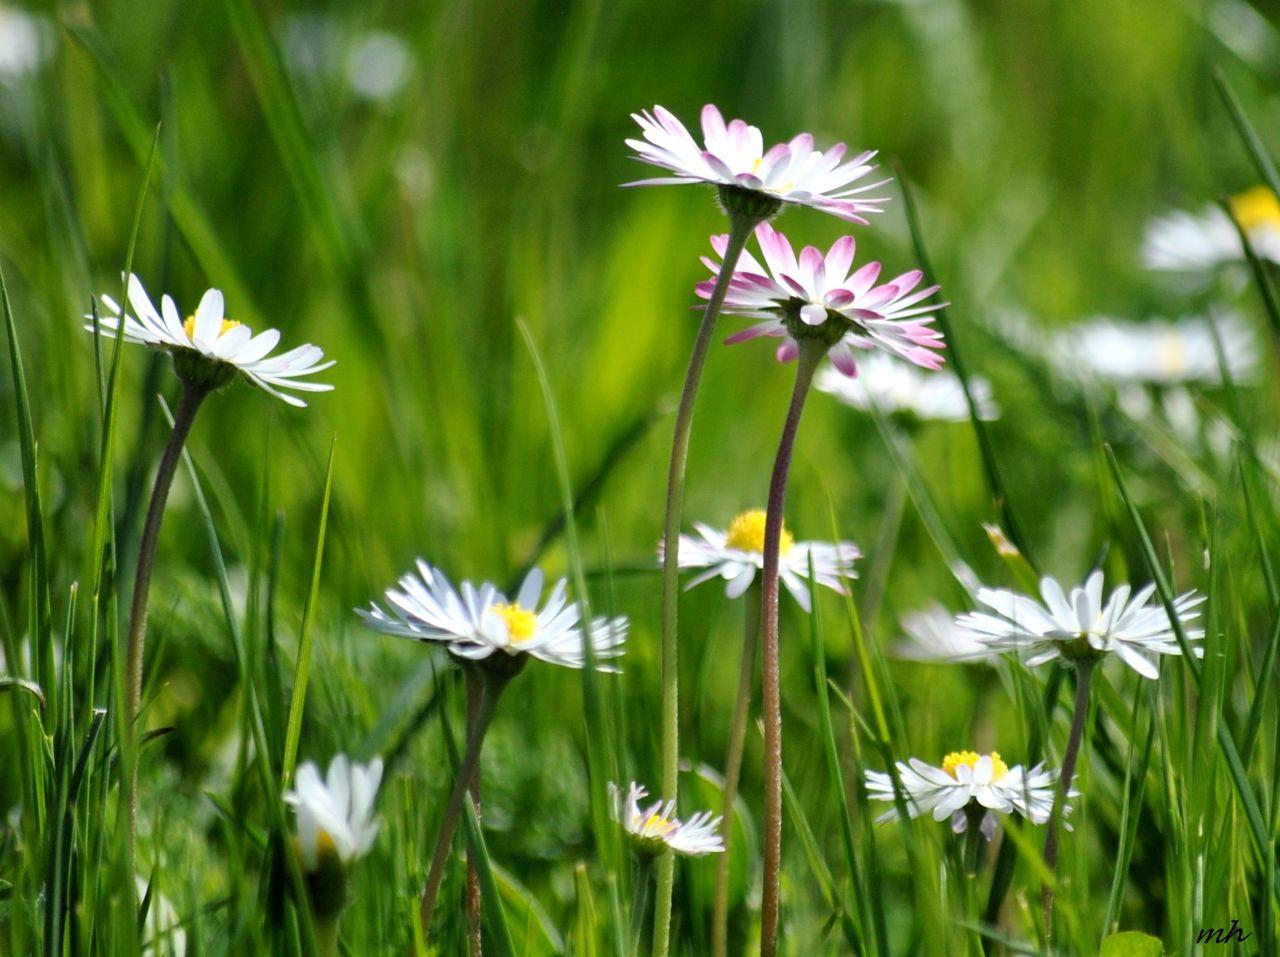 Hoa cỏ dại Hinh-n36